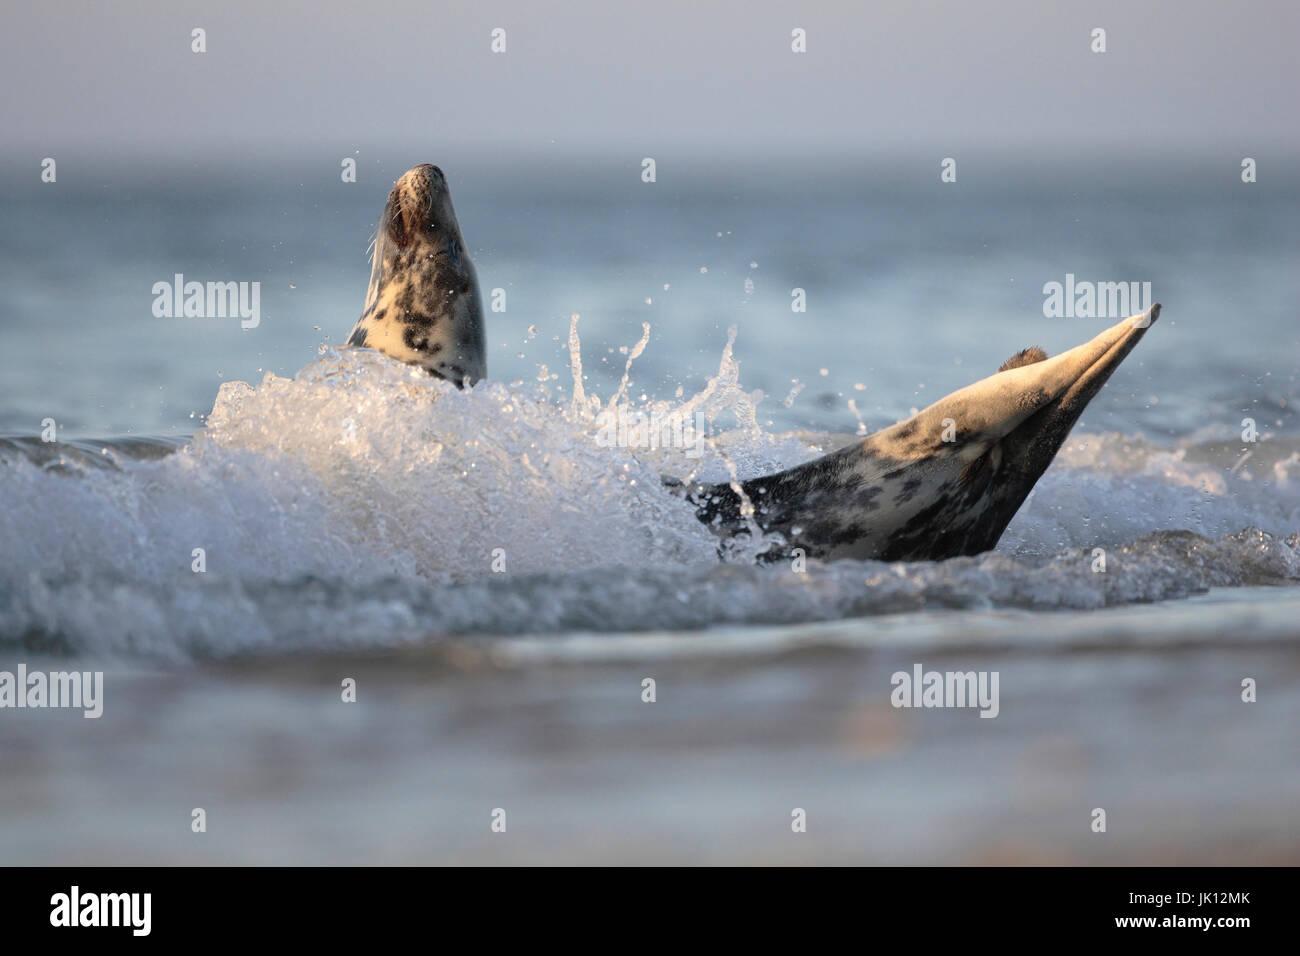 Cone seal halichoerus grypus, Kegelrobbe (halichoerus grypus) - Stock Image